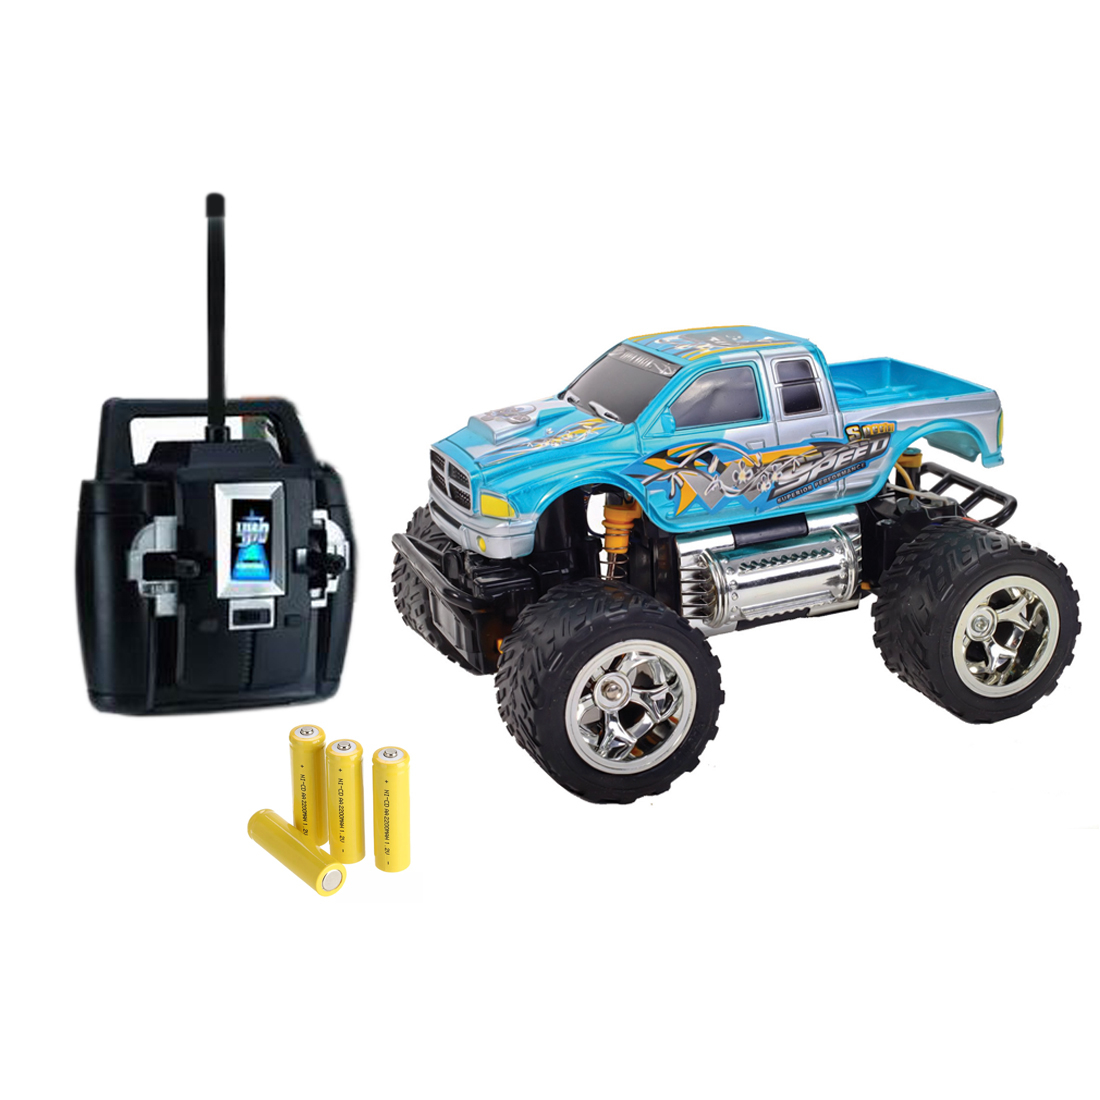 Фото - Игрушки на радиоуправлении Наша игрушка Джип конструктор на радиоуправлении джип сафари 1424934